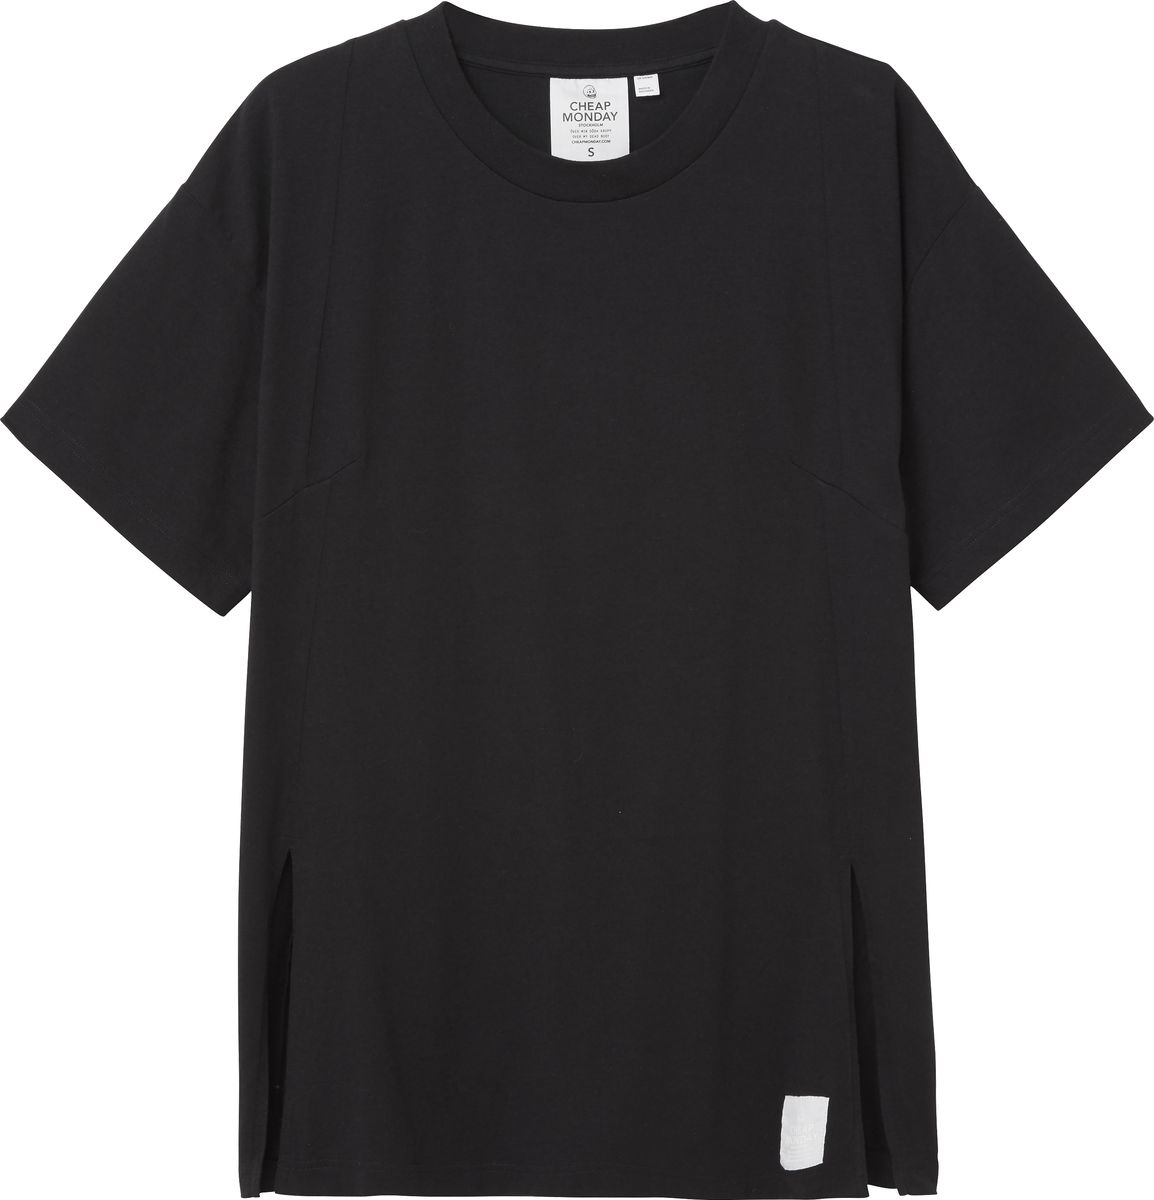 Футболка женская Cheap Monday, цвет: черный. 0515777. Размер XS (40) футболка женская diesel цвет черный 00svvp 0canr 900 размер xs 40